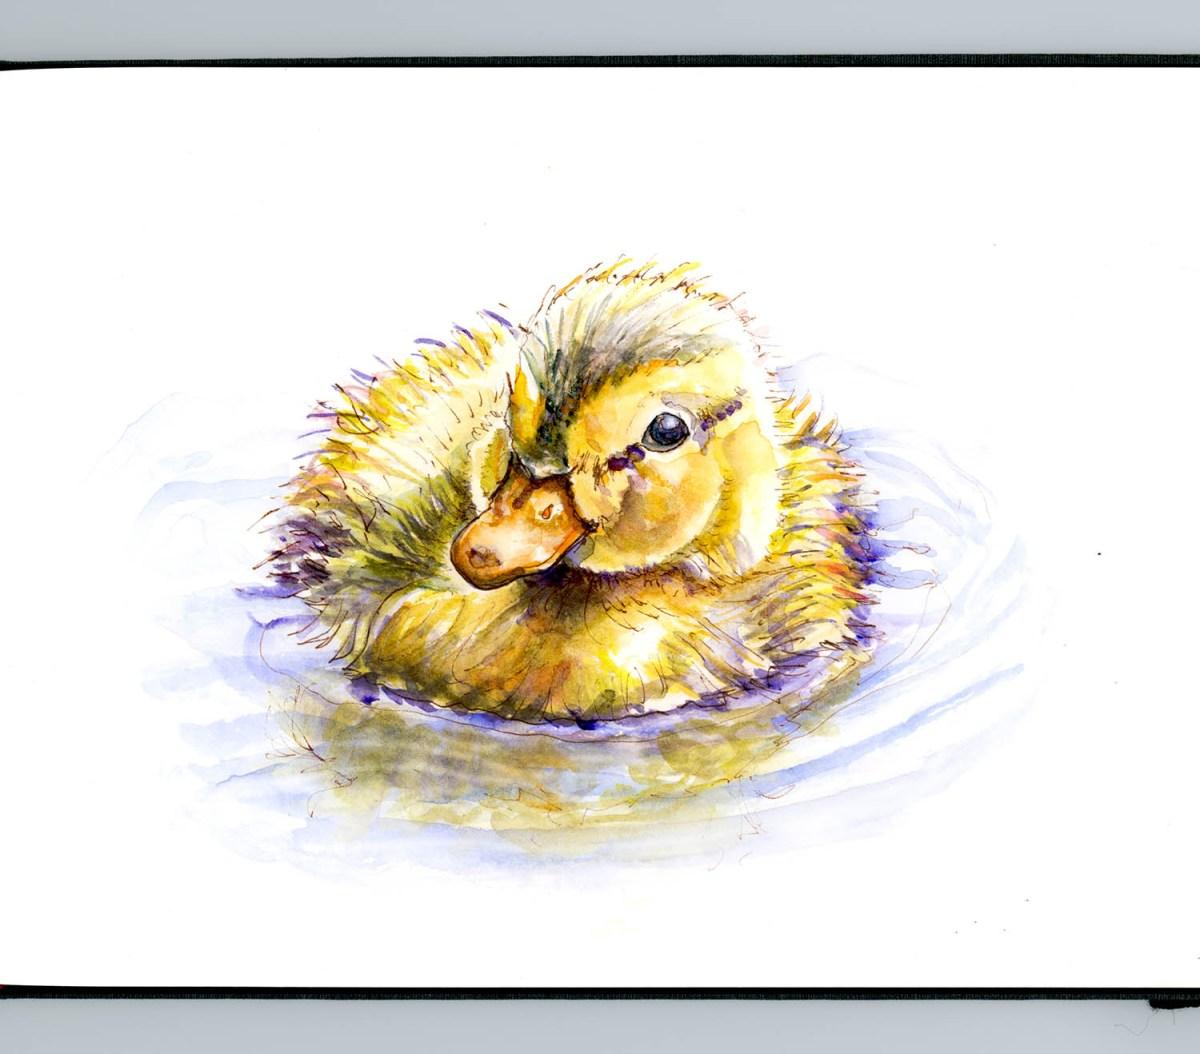 #WorldWatercolorGroup - Baby Duck Dreams - Doodlewash